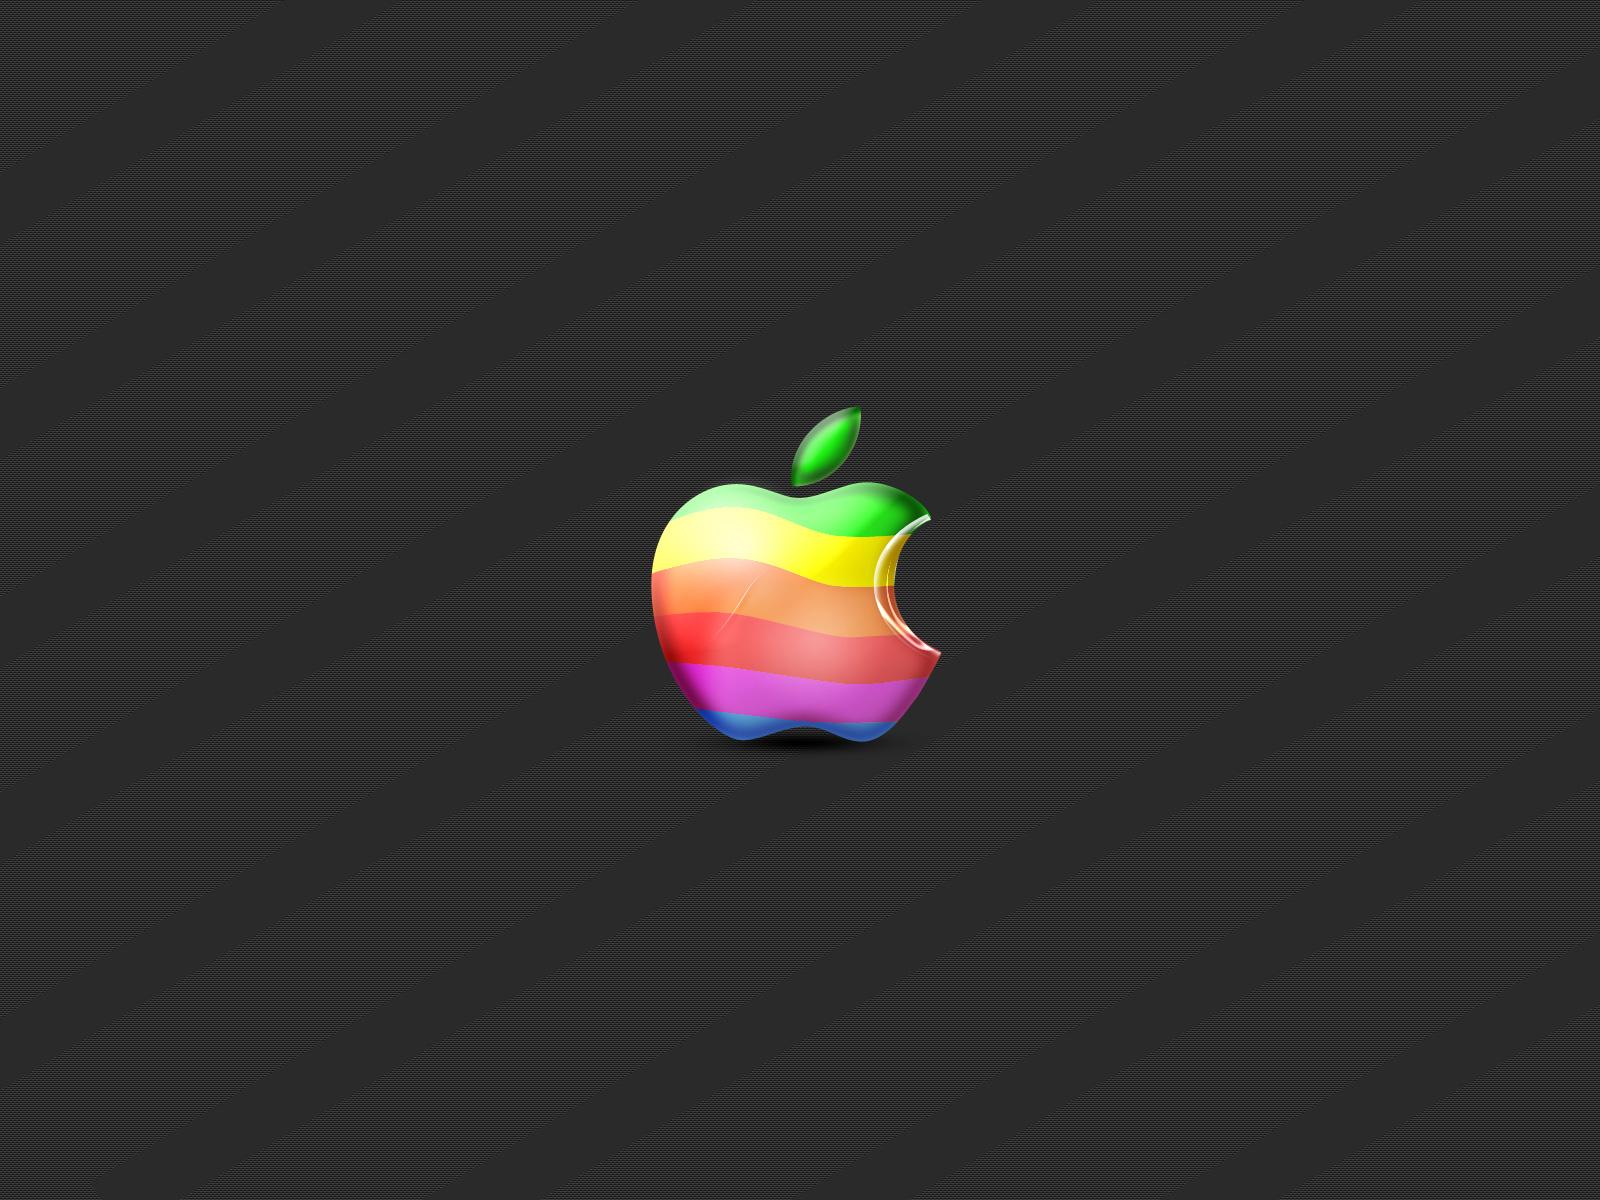 cool apple wallpaper cool wallpaper cool wallpaper for desktop cool 1600x1200